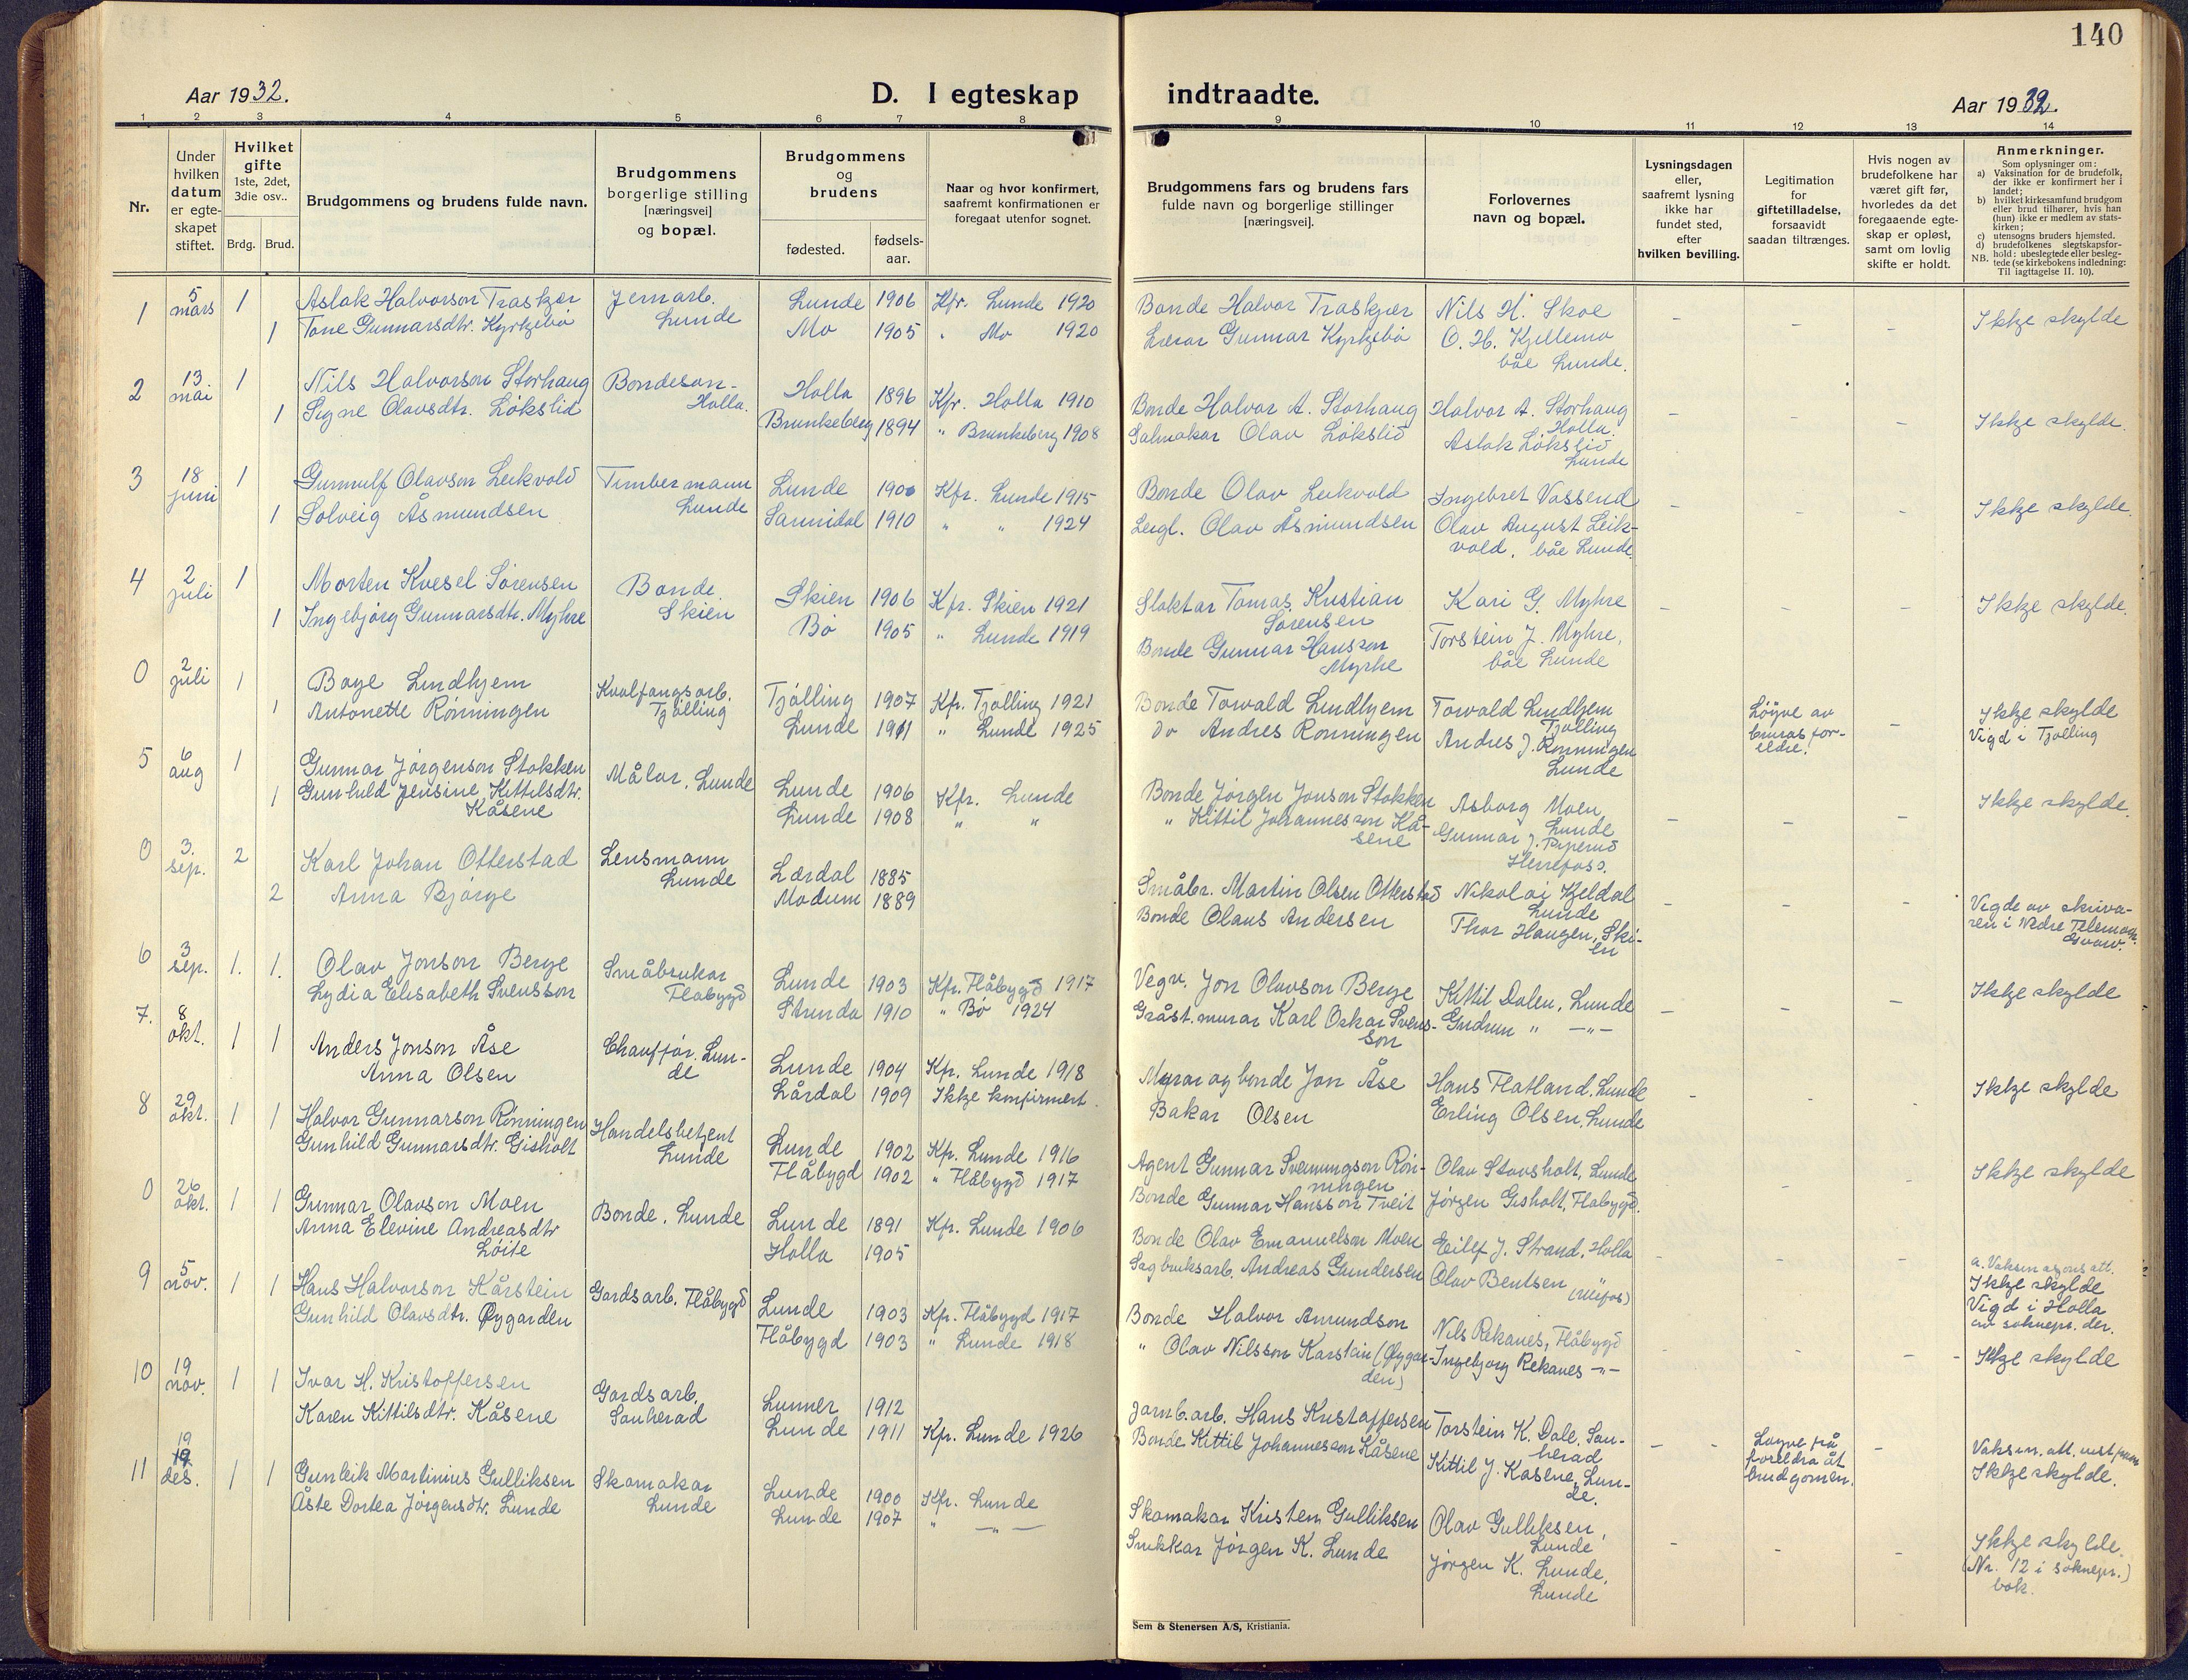 SAKO, Lunde kirkebøker, F/Fa/L0006: Ministerialbok nr. I 6, 1922-1940, s. 140